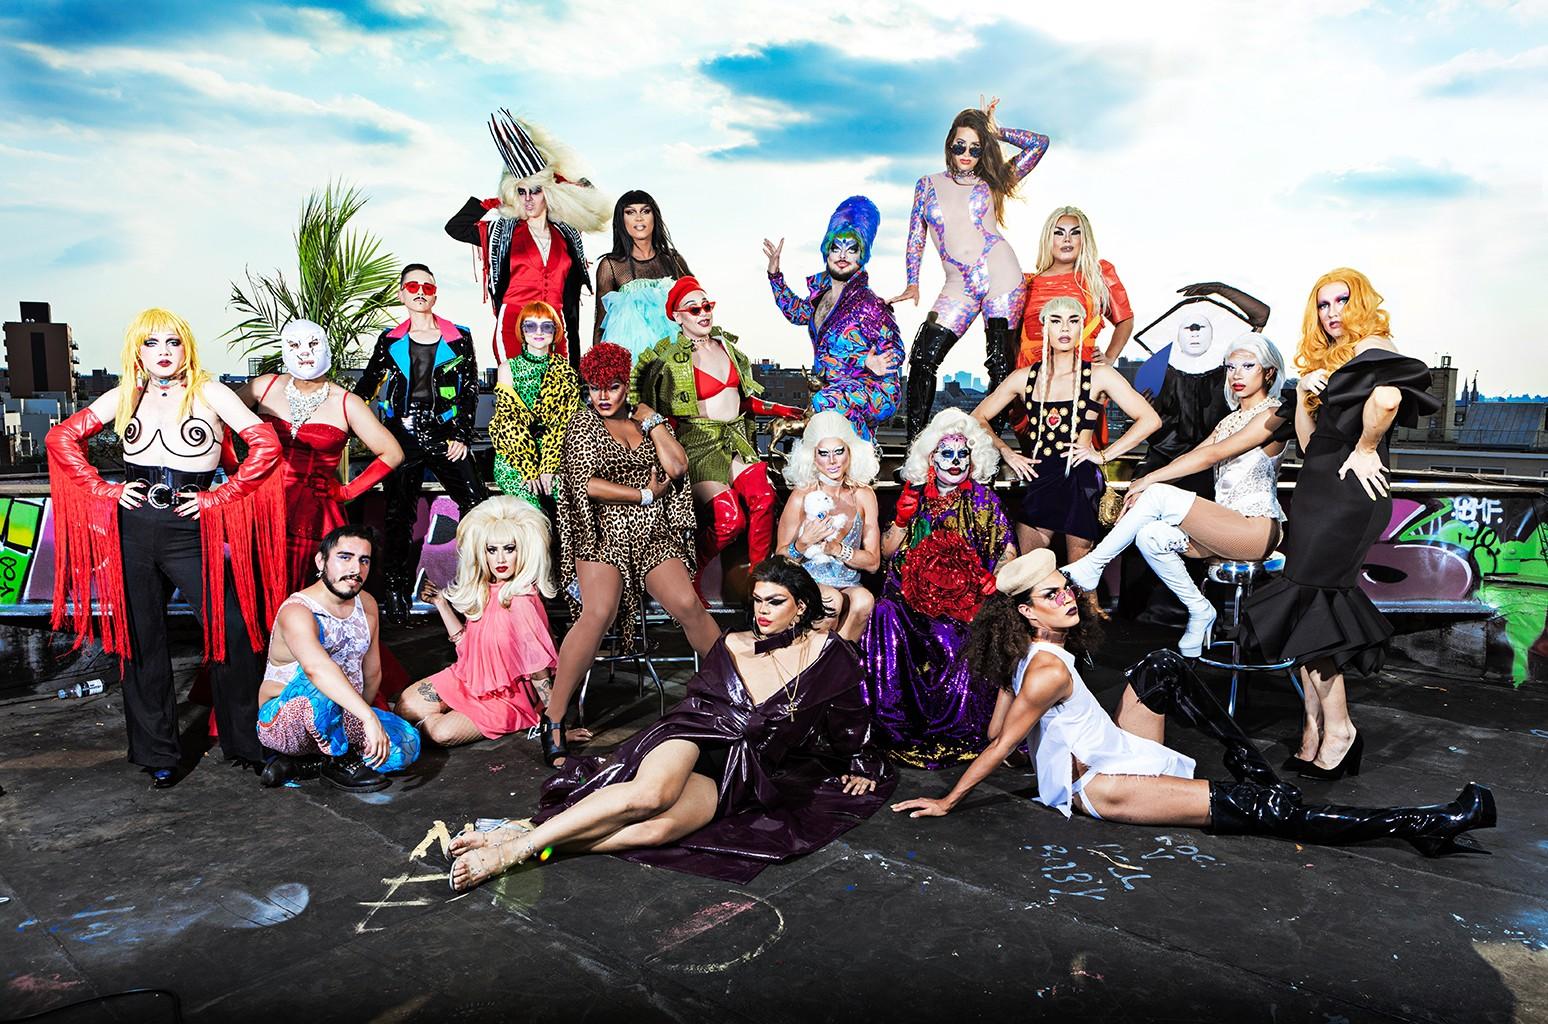 Bushwig drag queens